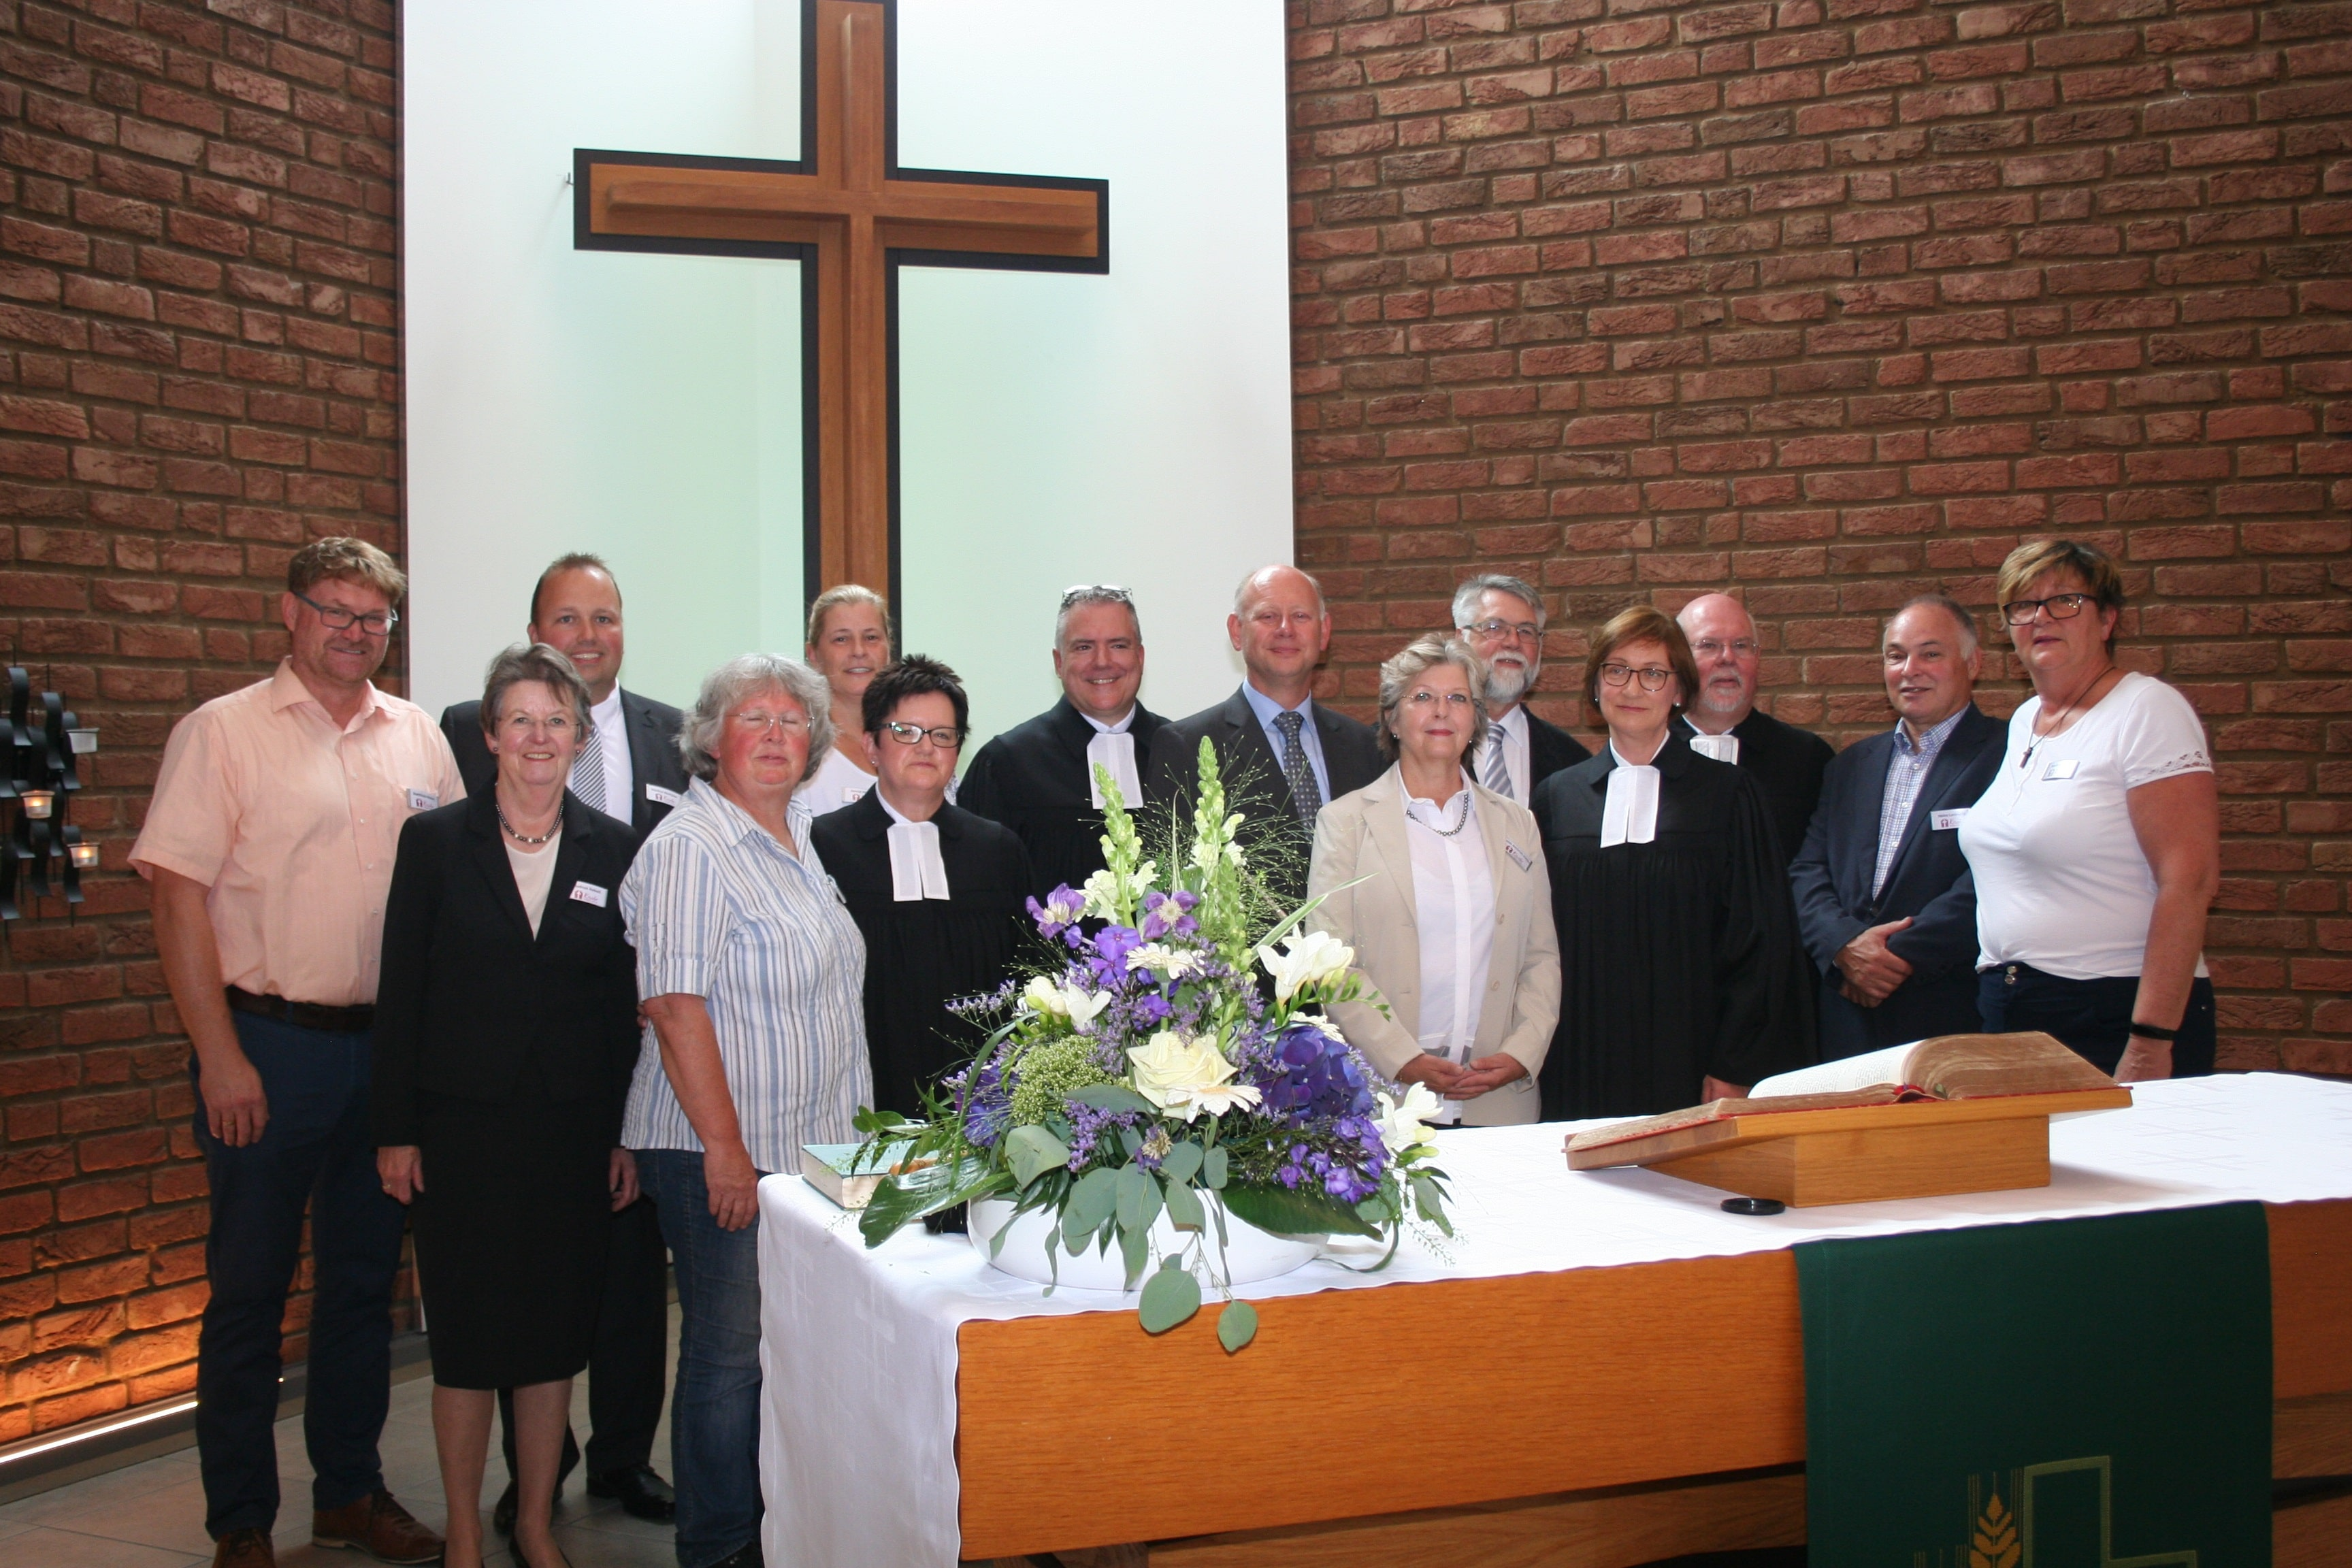 Theologie-Gottesdienst-Ausschuss/E @ Elmpt